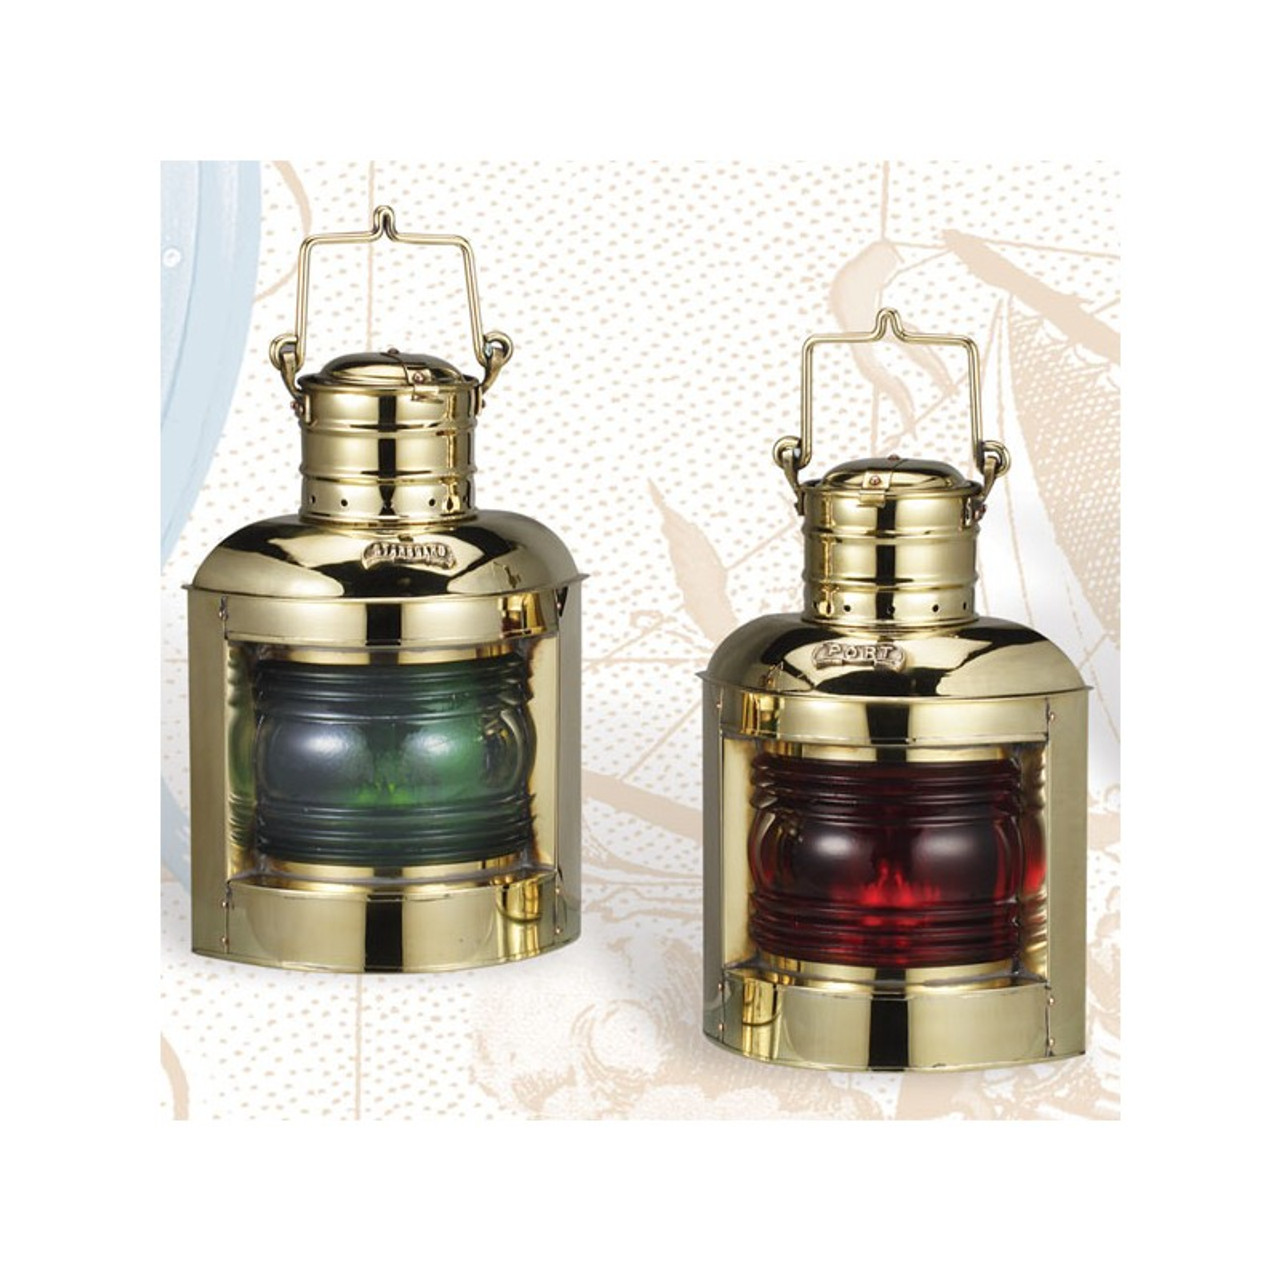 "(BL-835 Oil)  Set of 2 Deluxe 12.5"" Port and Starboard Oil Burning Lanterns"